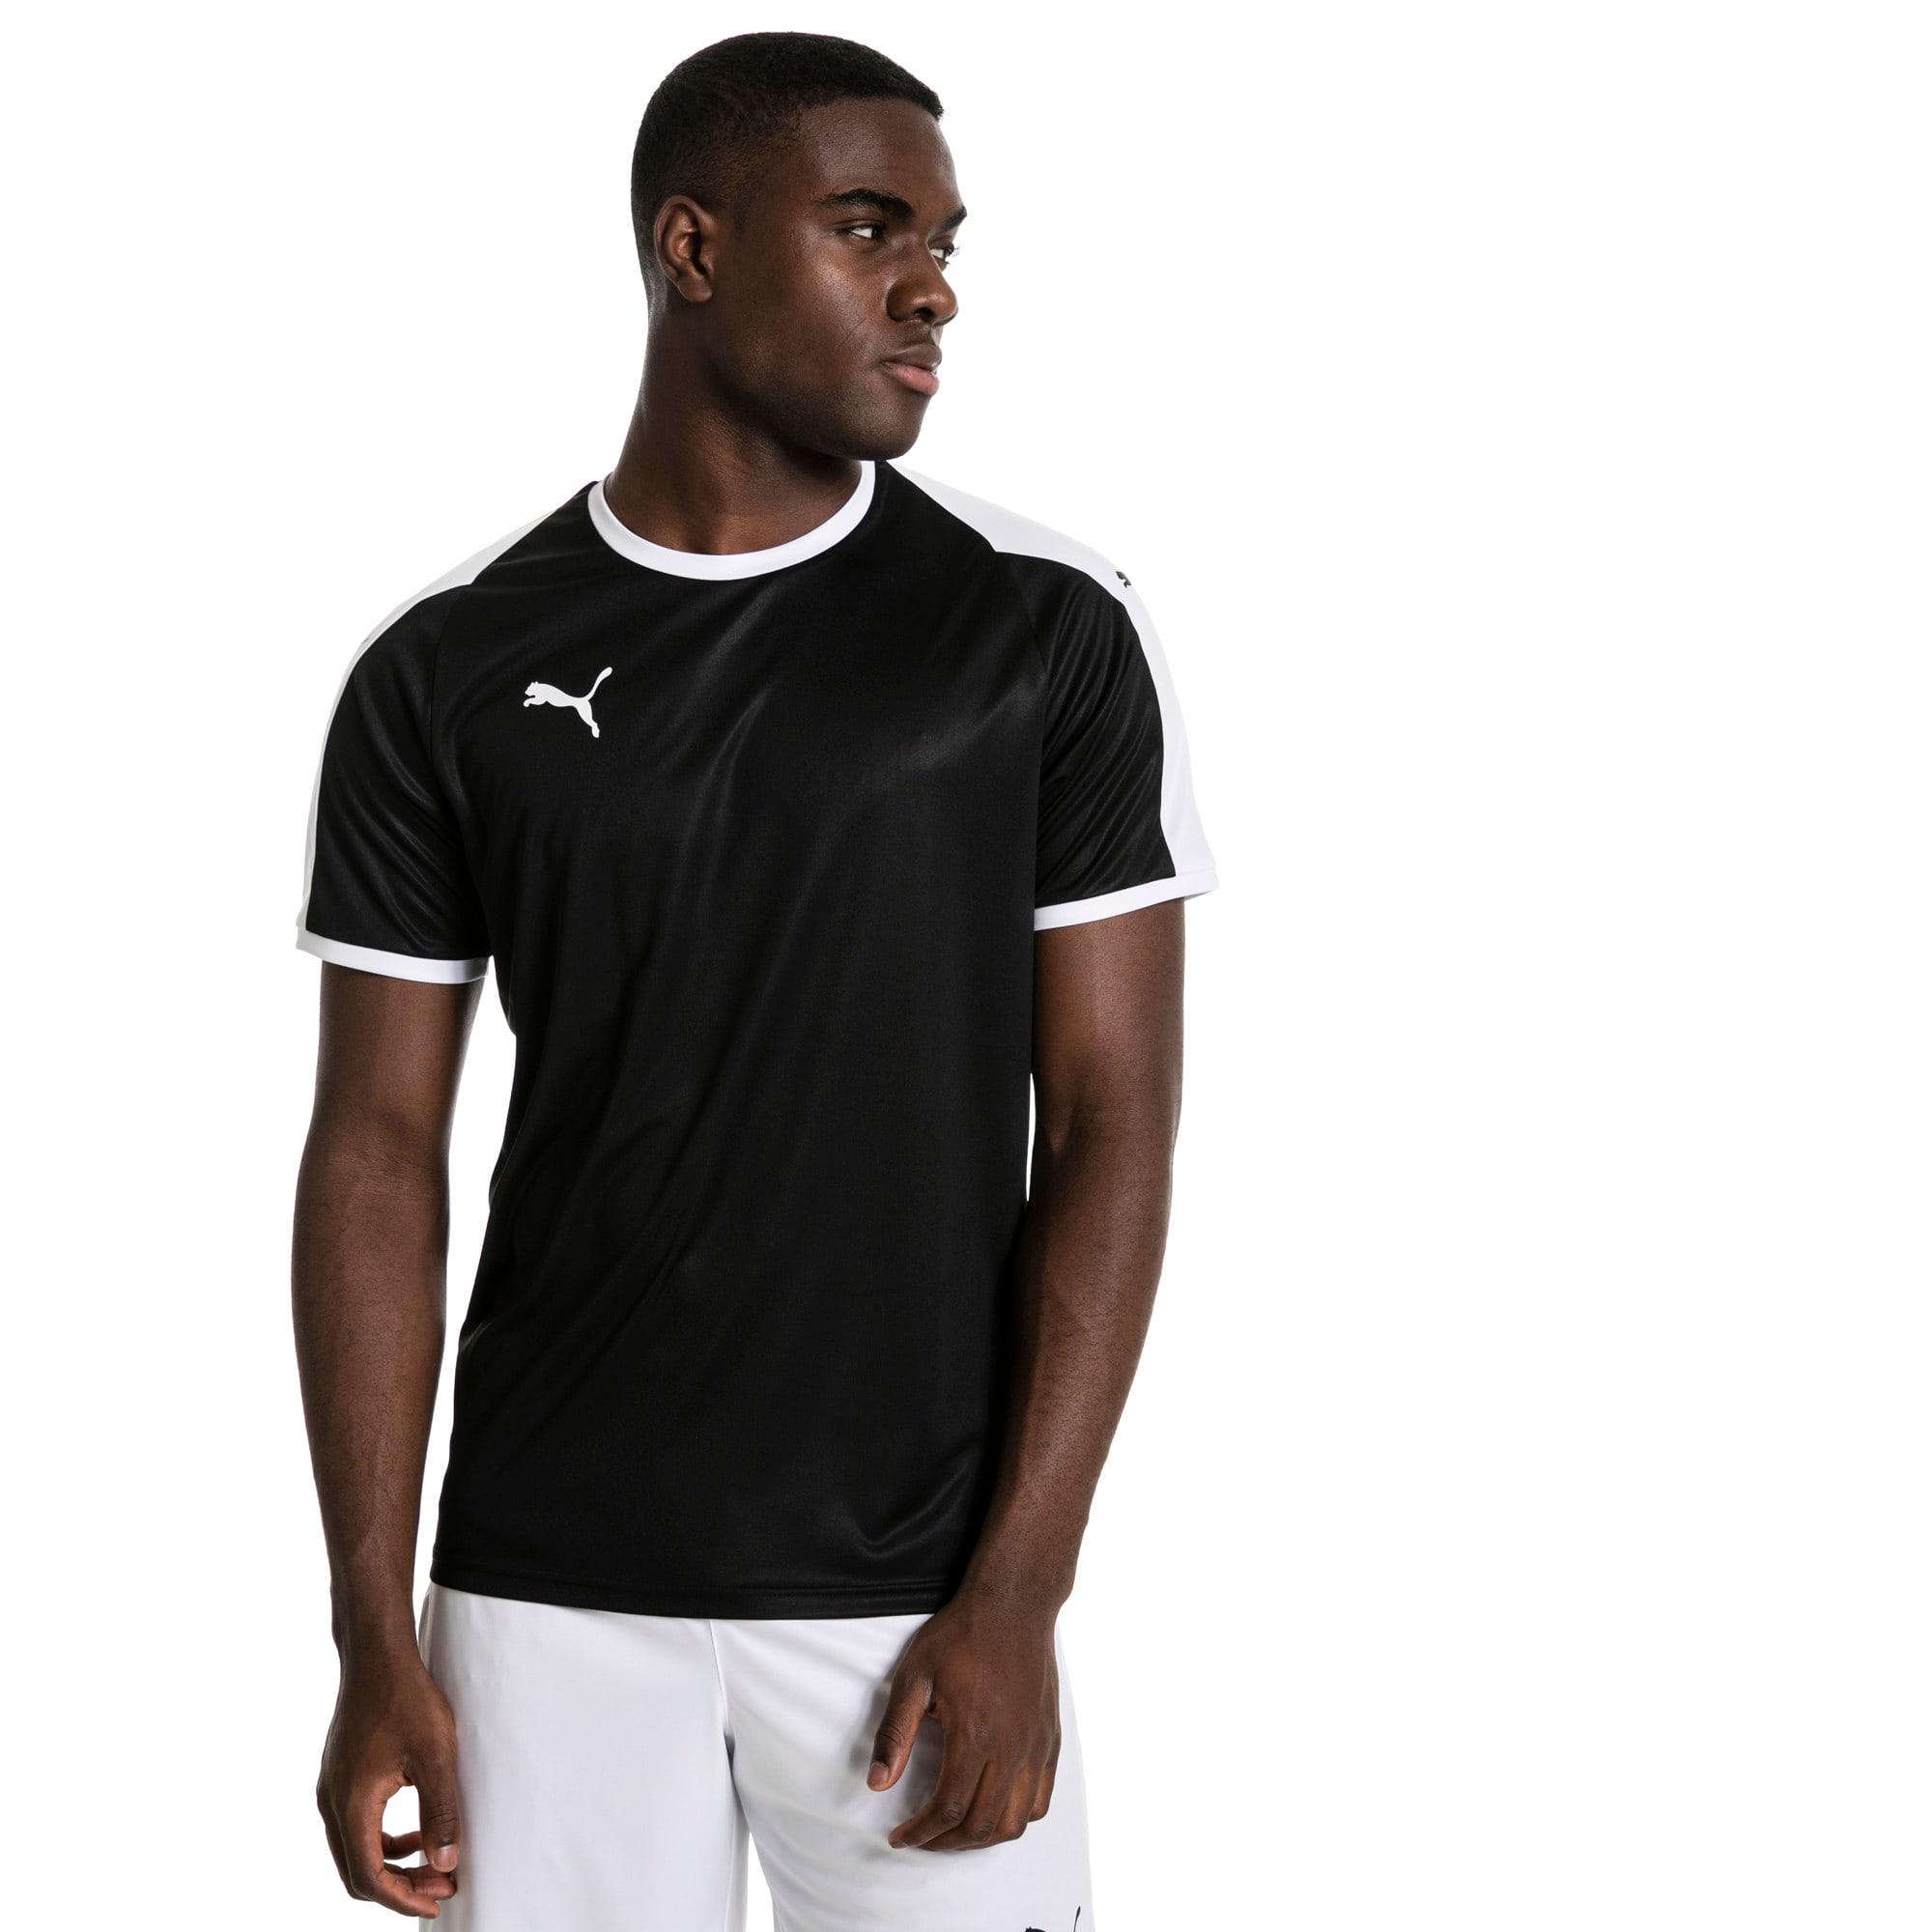 Thumbnail 1 of Liga shirt voor heren, Puma Black-Puma White, medium